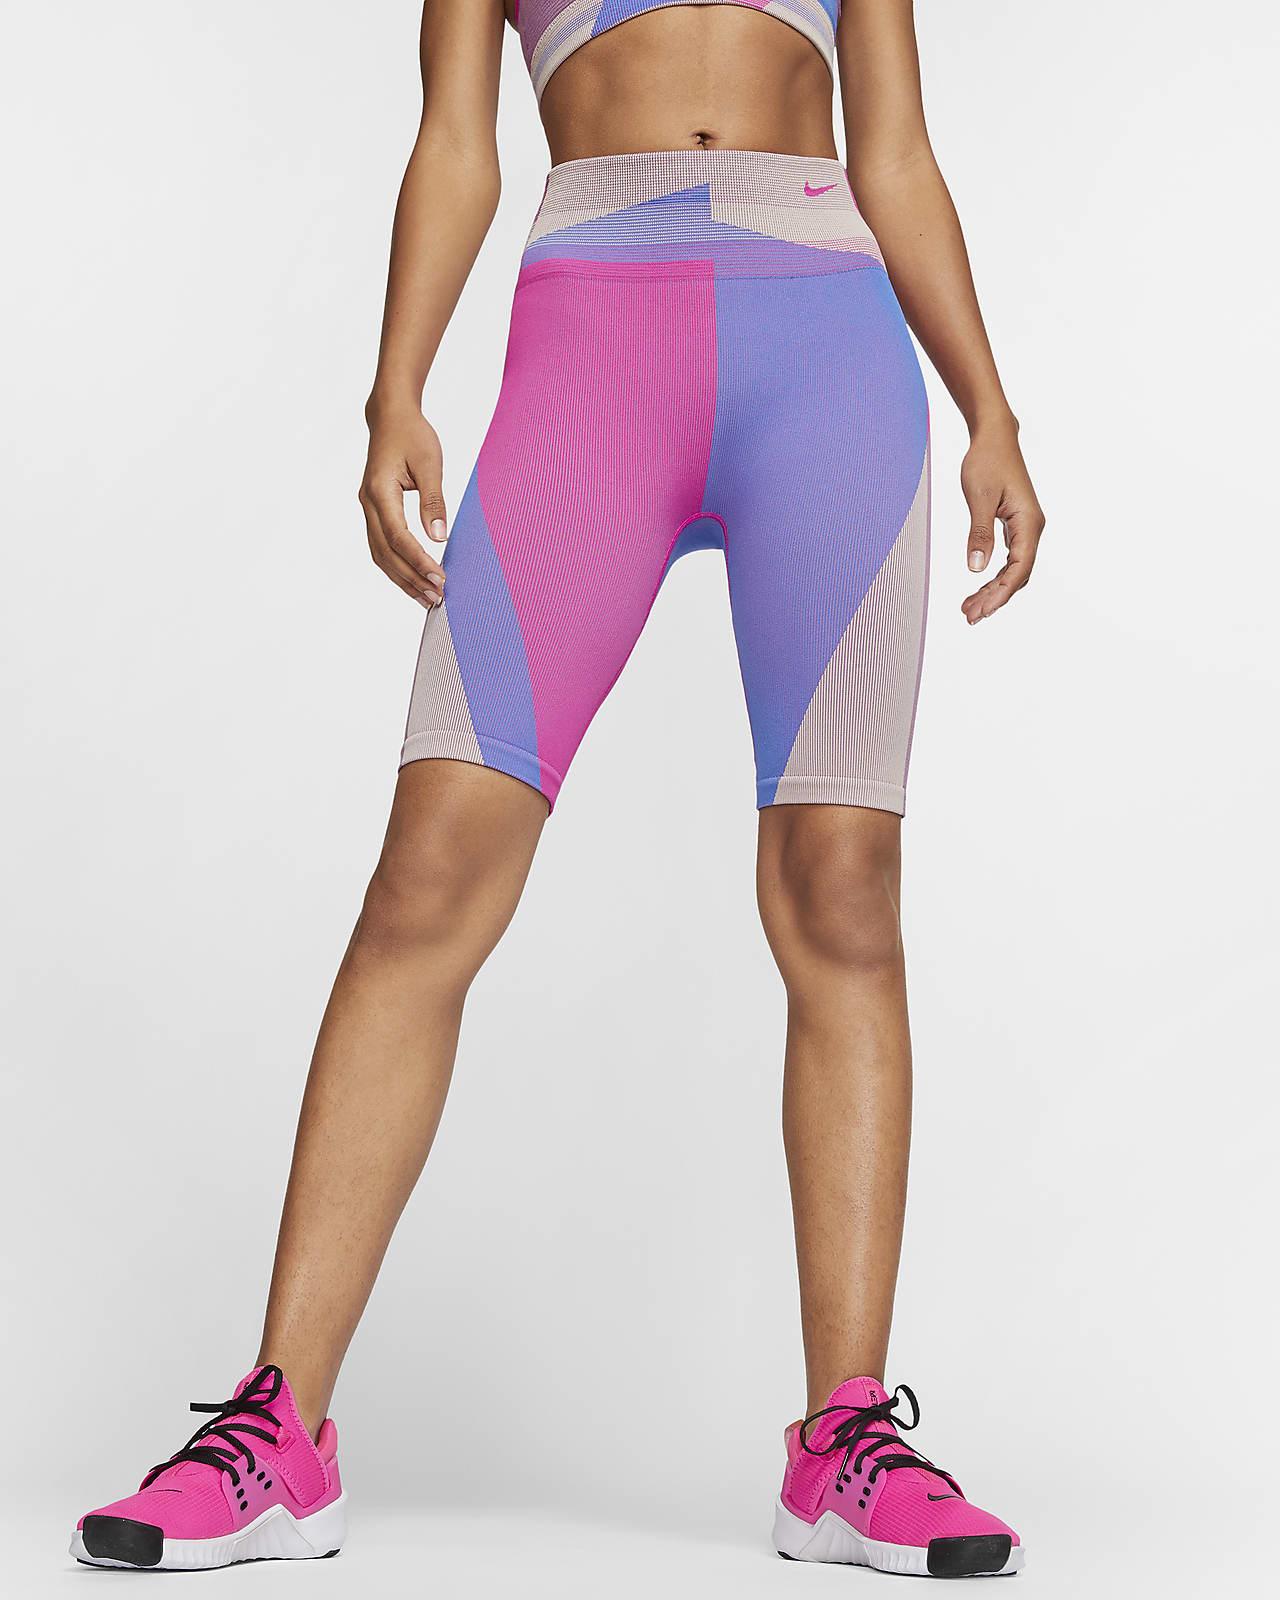 Nike Icon Clash Women's Seamless 20cm (approx.) Training Shorts